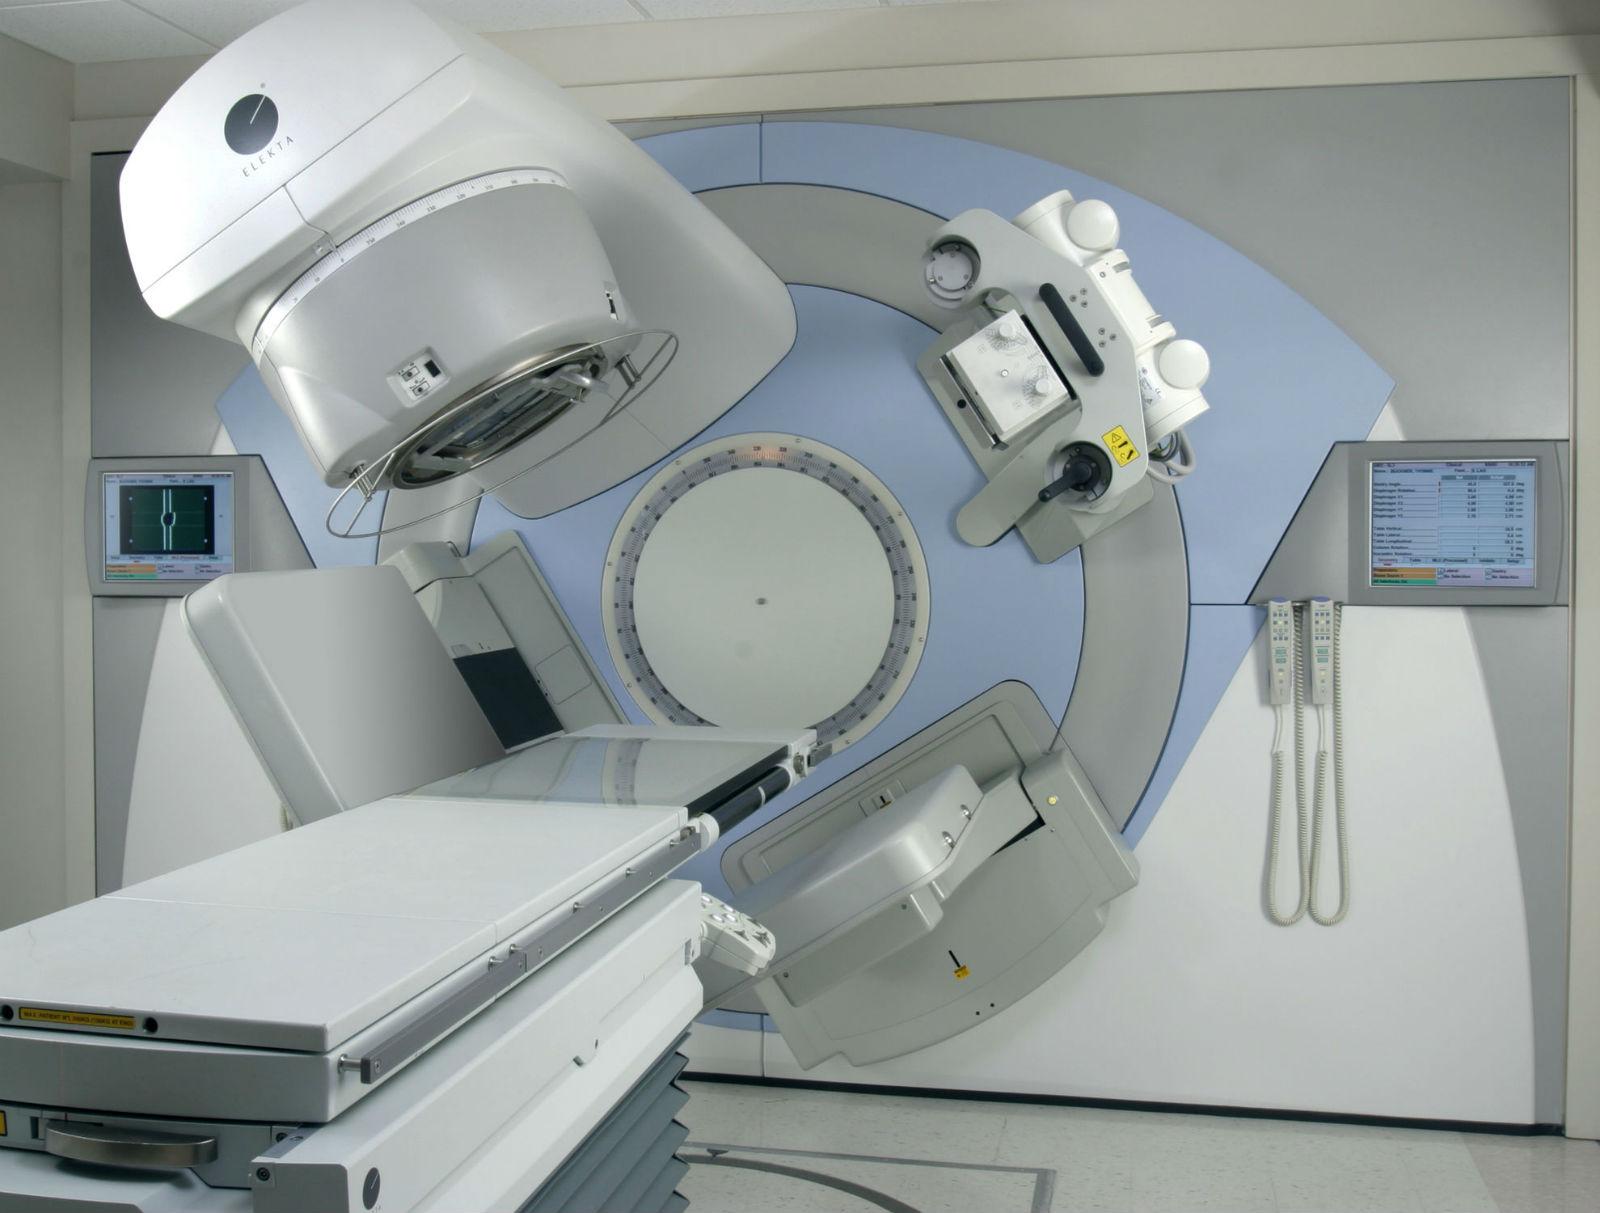 mexicana radioterapia no dañará tejidos